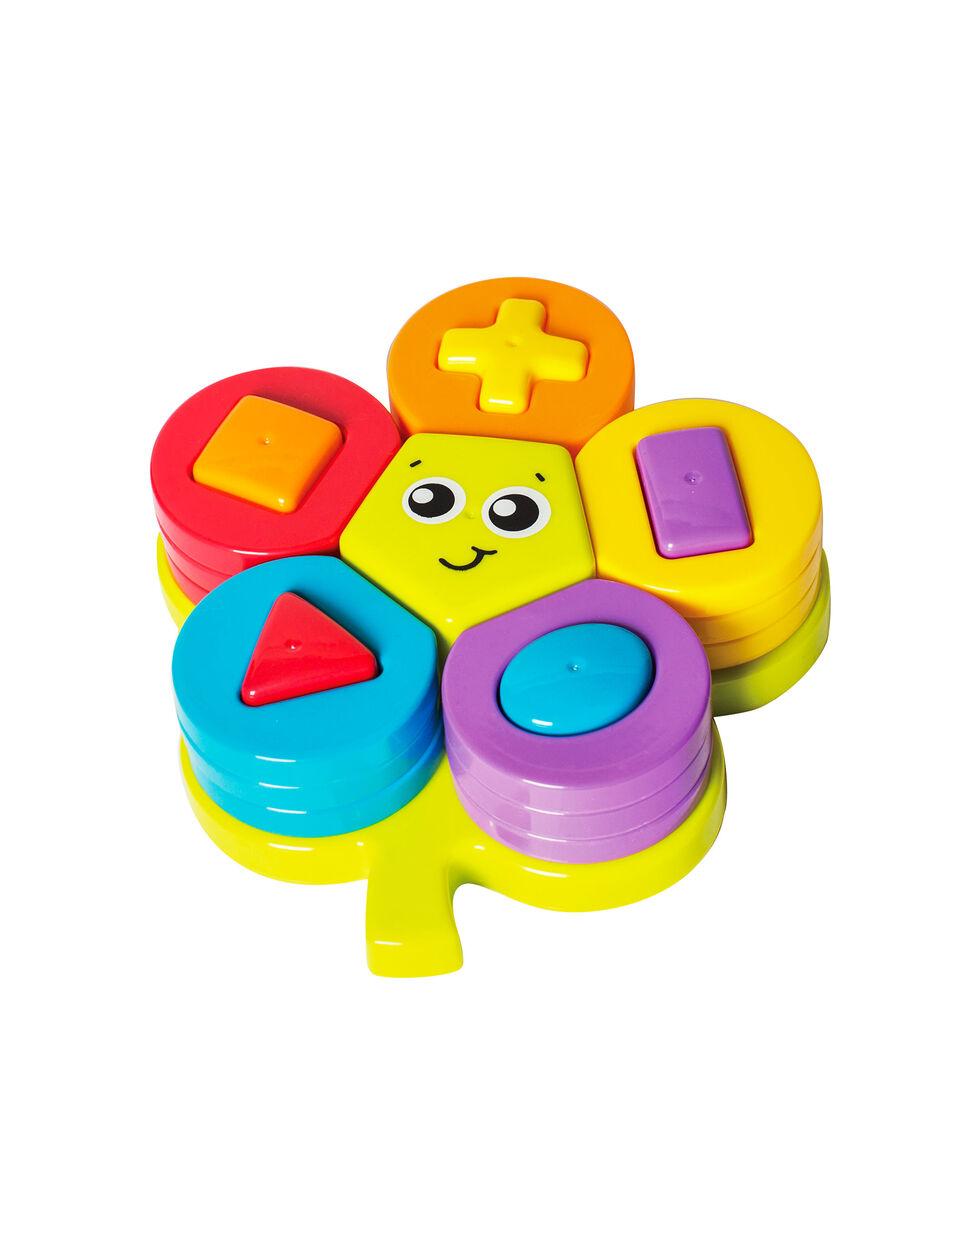 Puzzle de Formas Geométricas Playgro